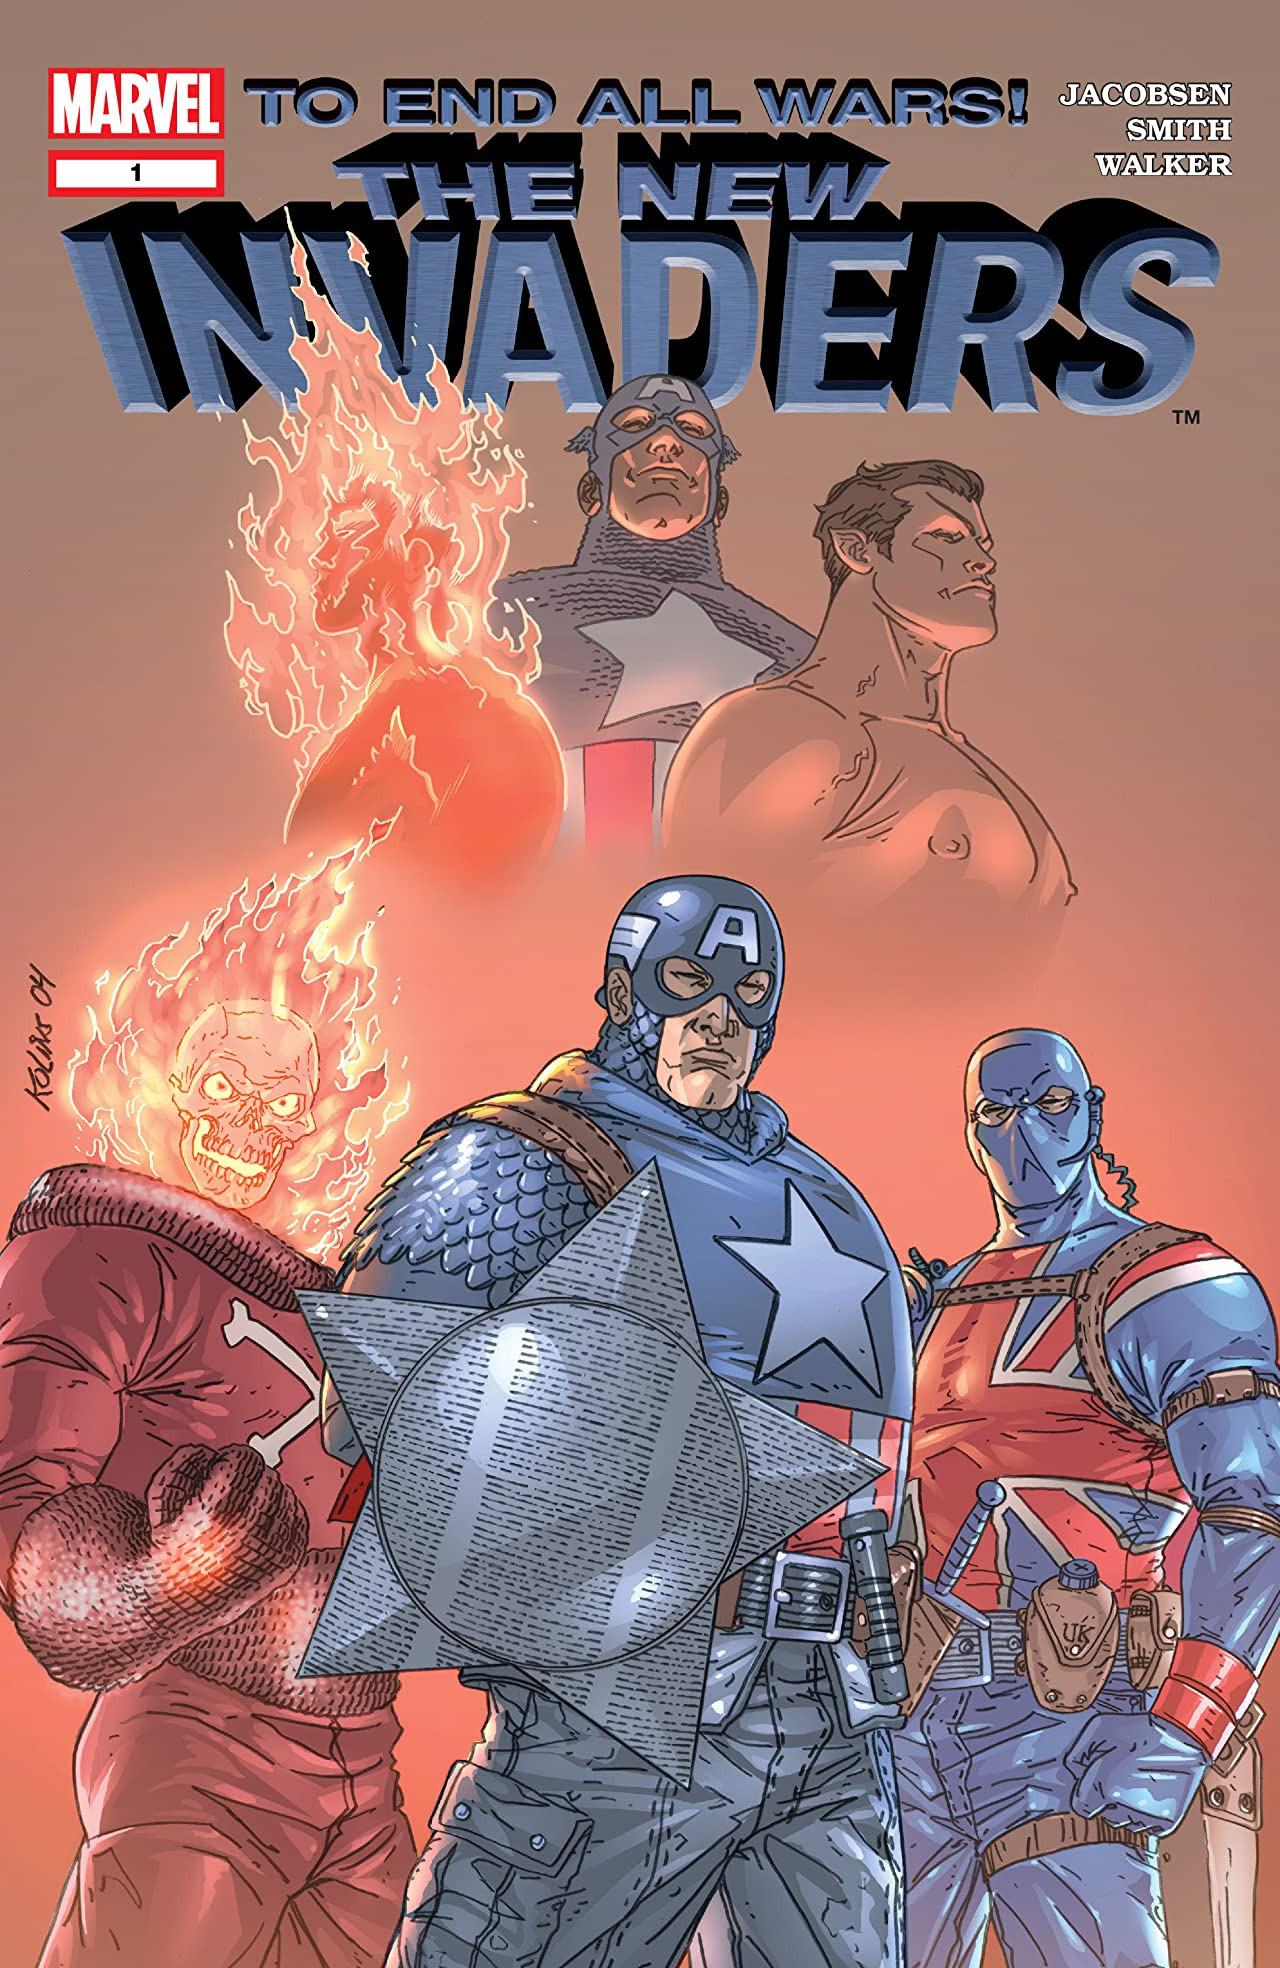 Marvel's Invaders by xcub on DeviantArt